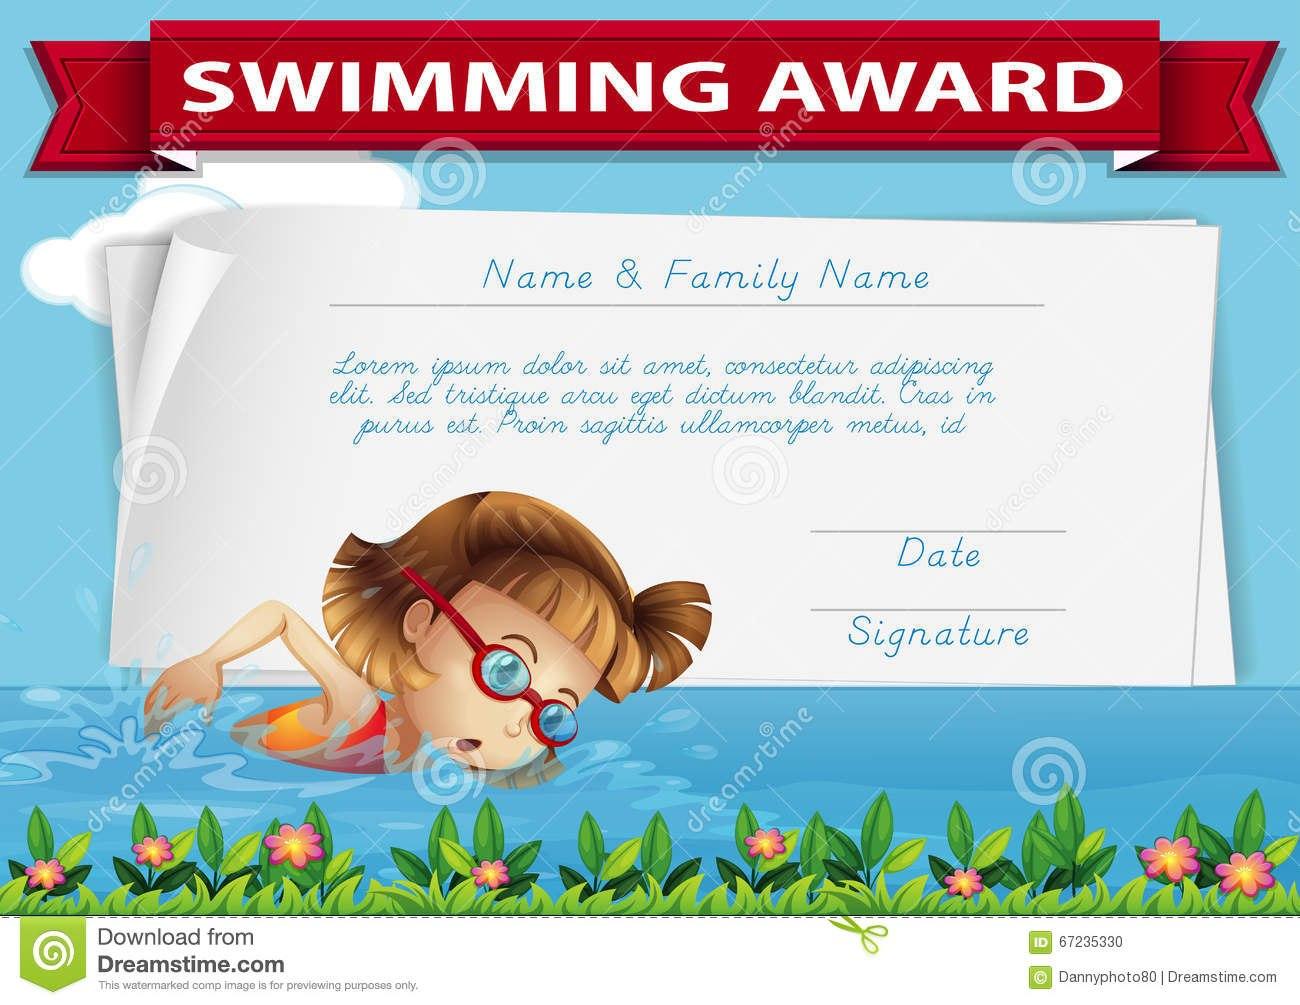 Swimming Award Certificate Template Stock Illustration Inside Free Swimming Certificate Templates